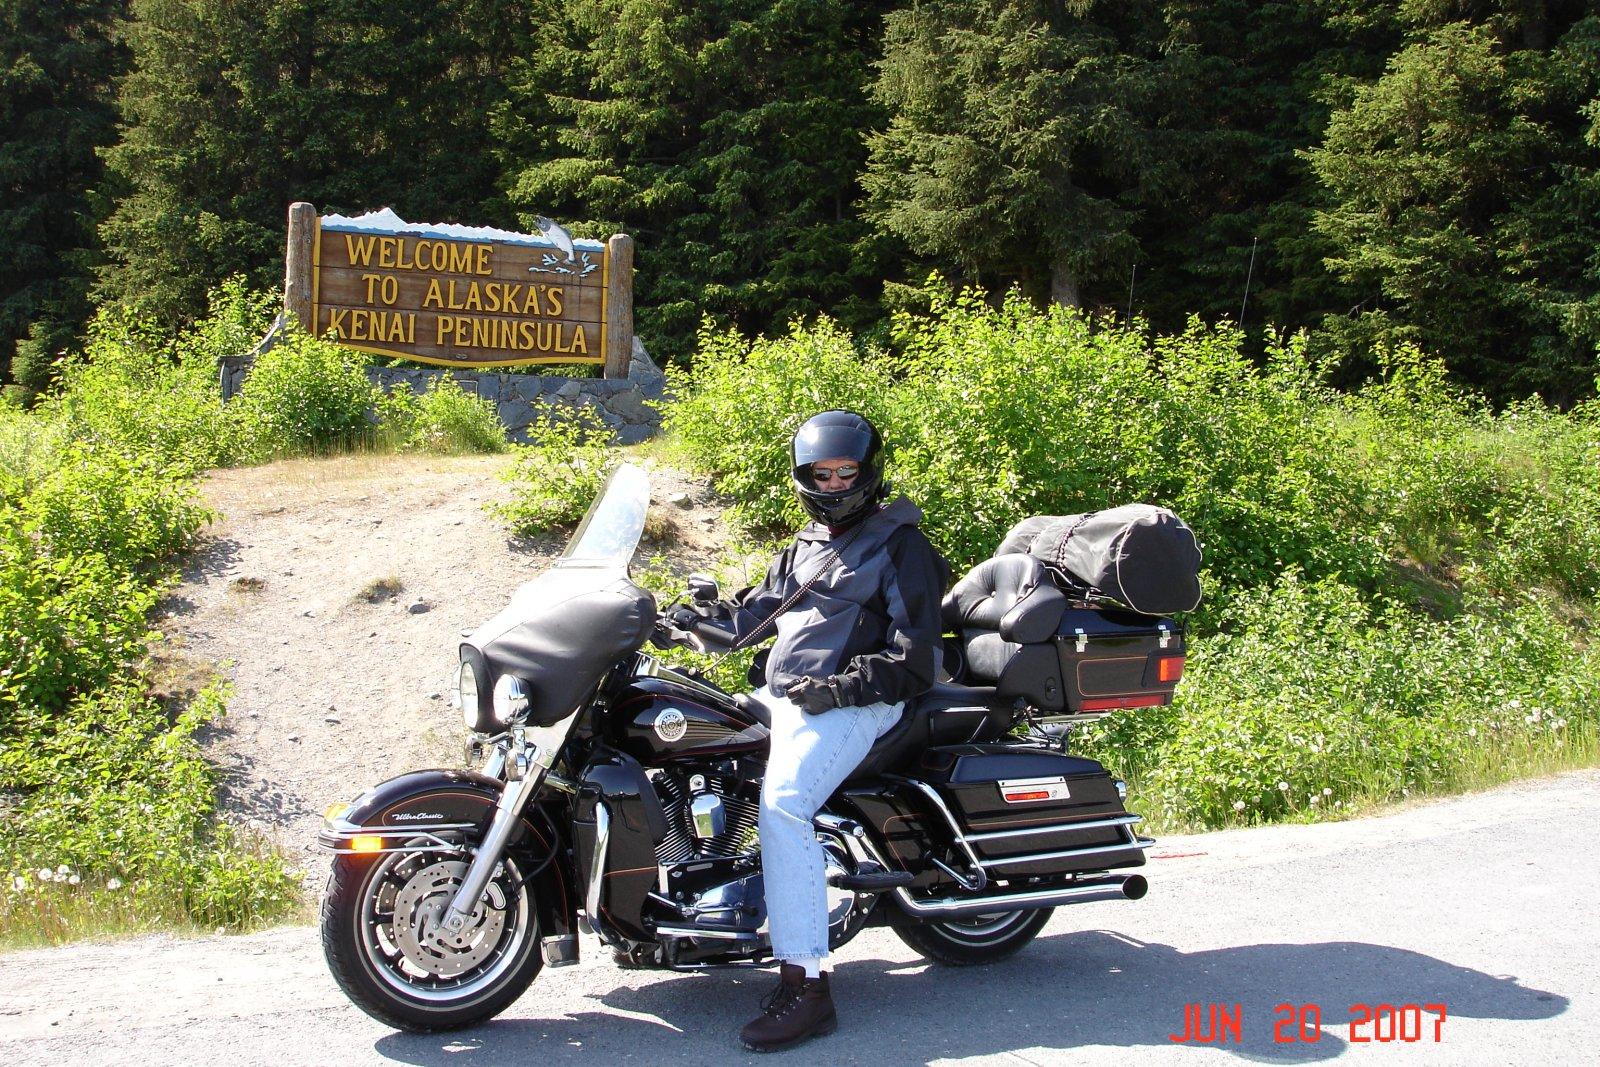 Click image for larger version  Name:Alaska 2007 054.jpg Views:31 Size:619.6 KB ID:88008